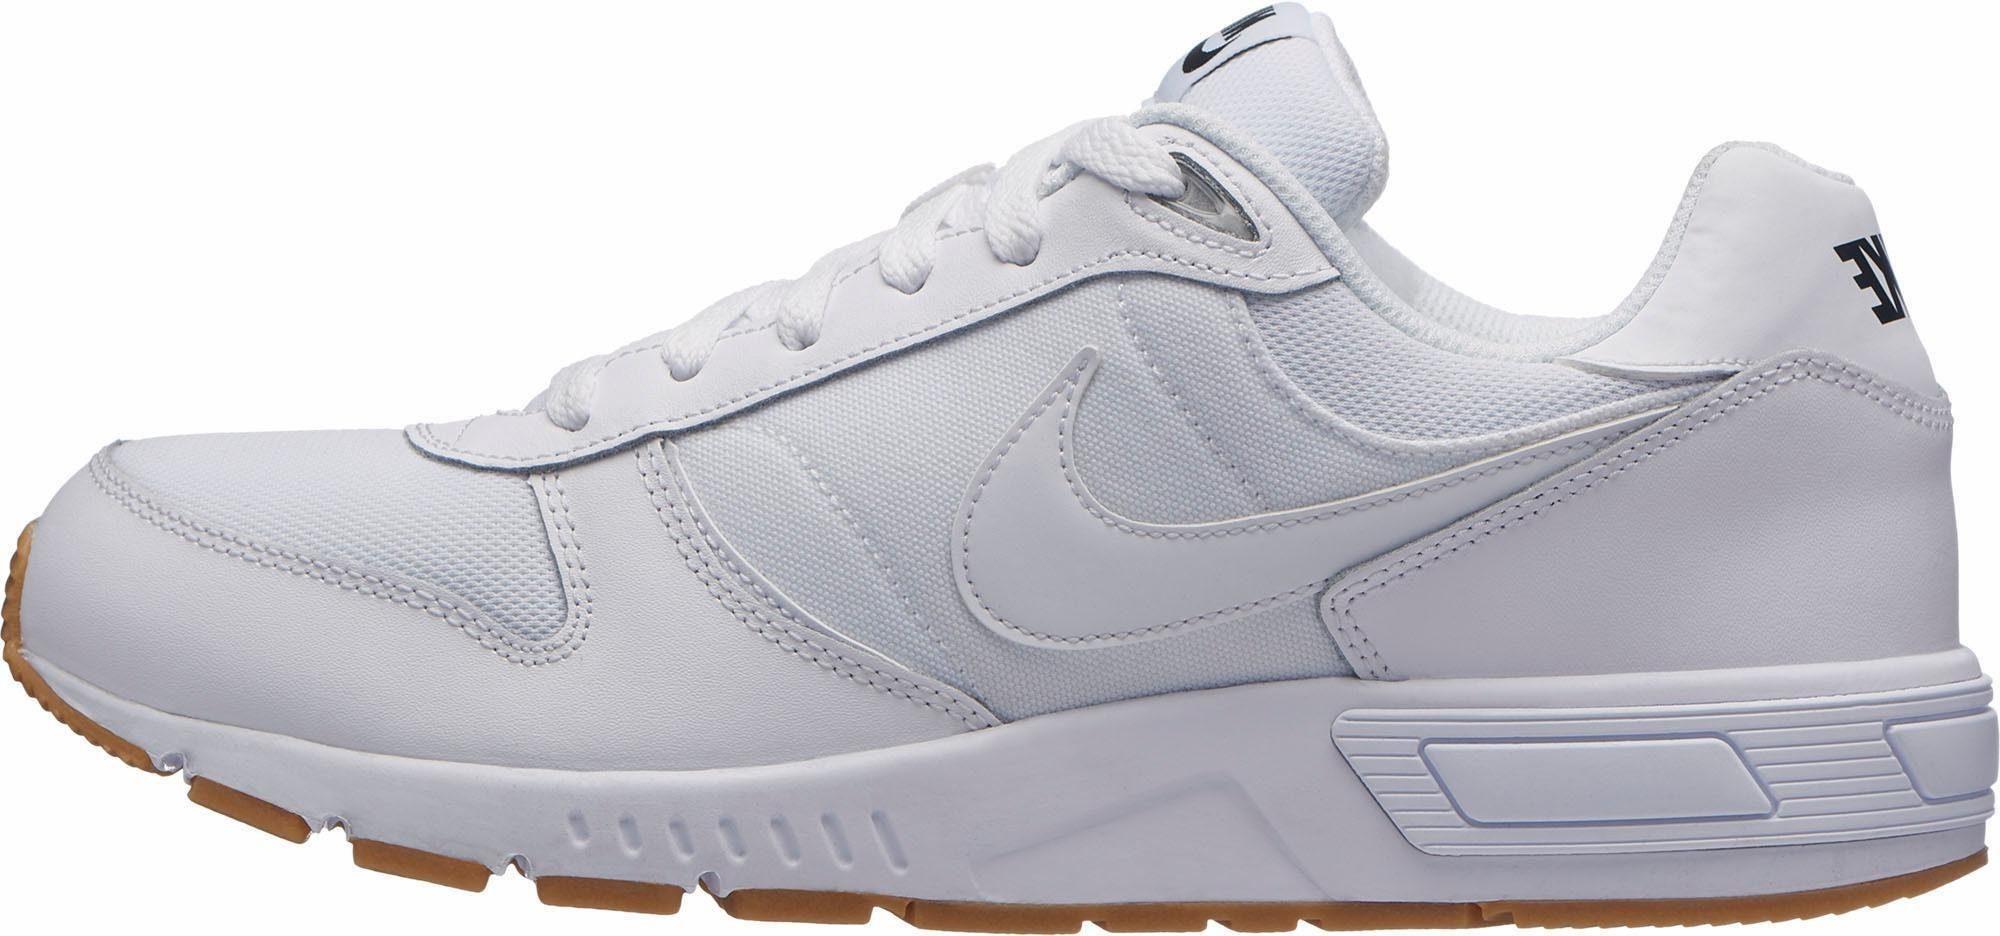 Nike Sportswear Nightgazer Sneaker online kaufen  weiß